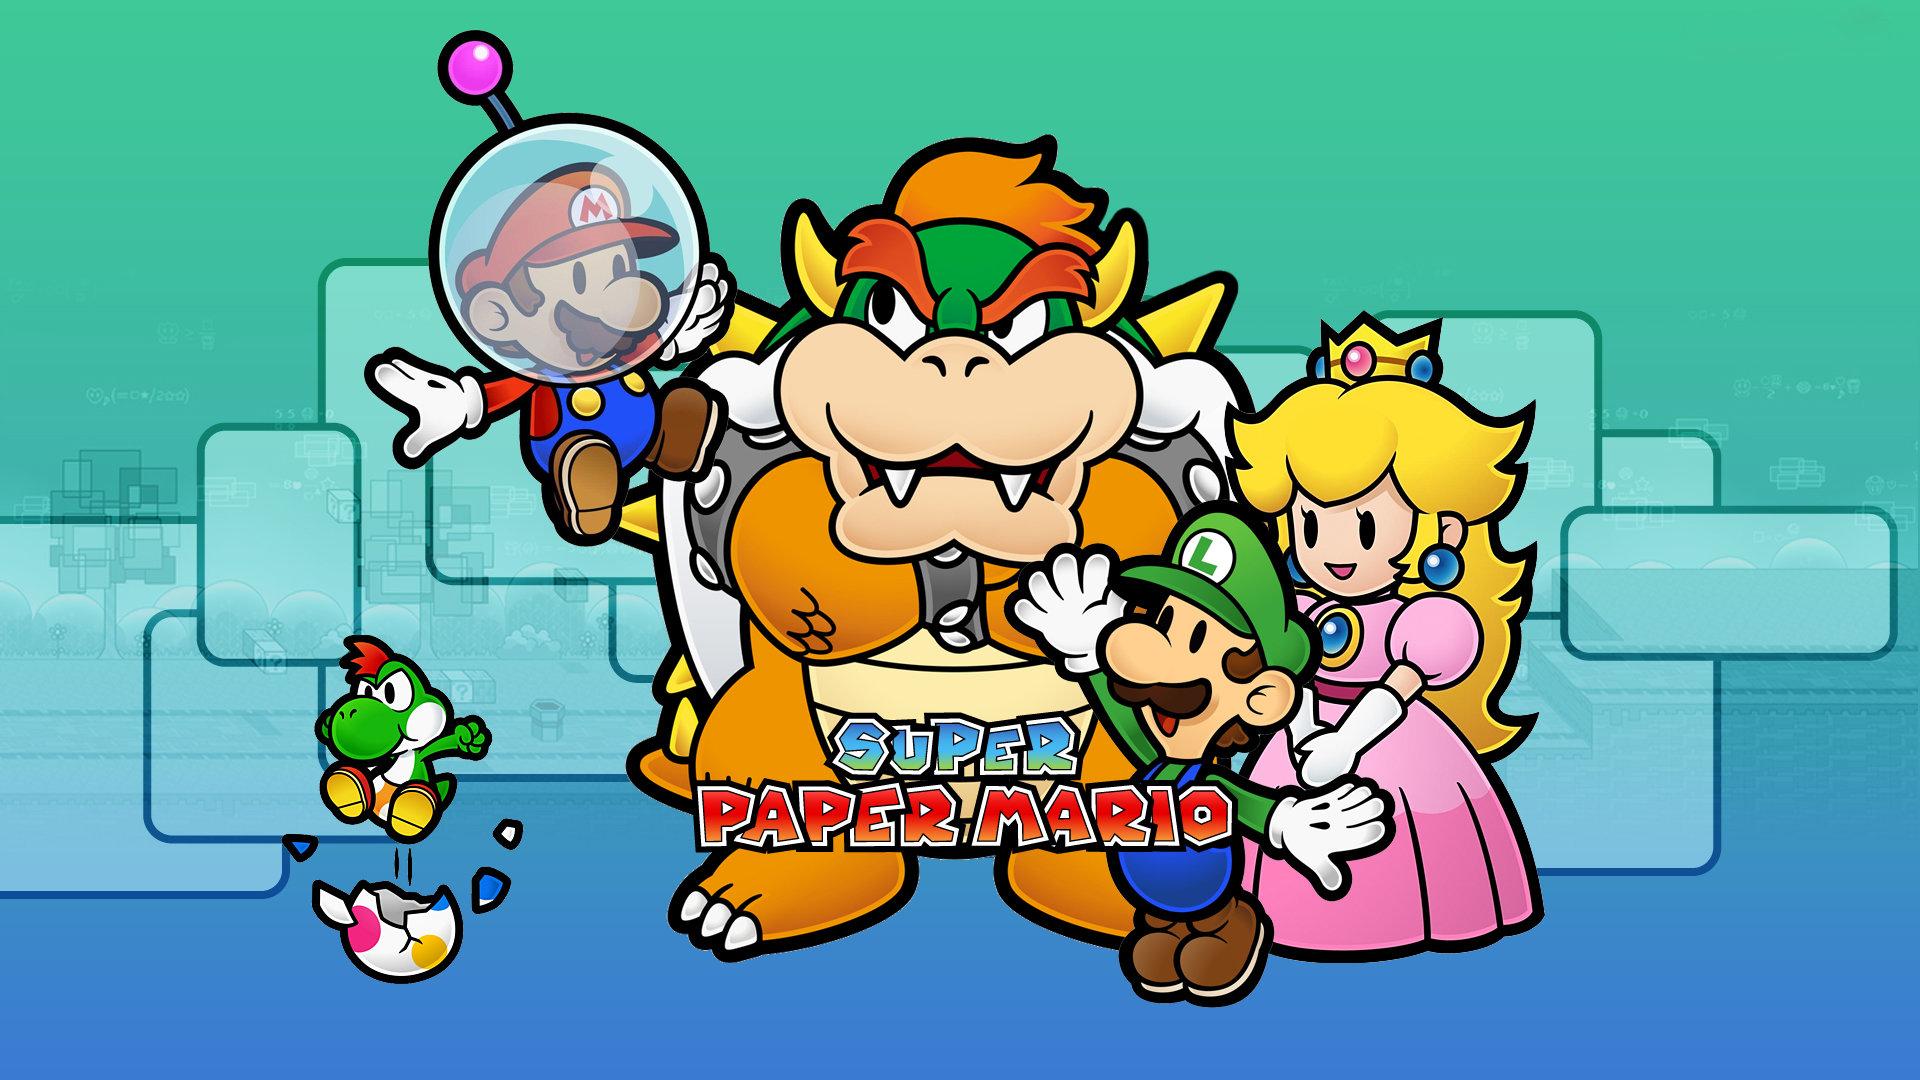 Super Paper Mario Wallpapers 1920x1080 Full Hd 1080p Desktop